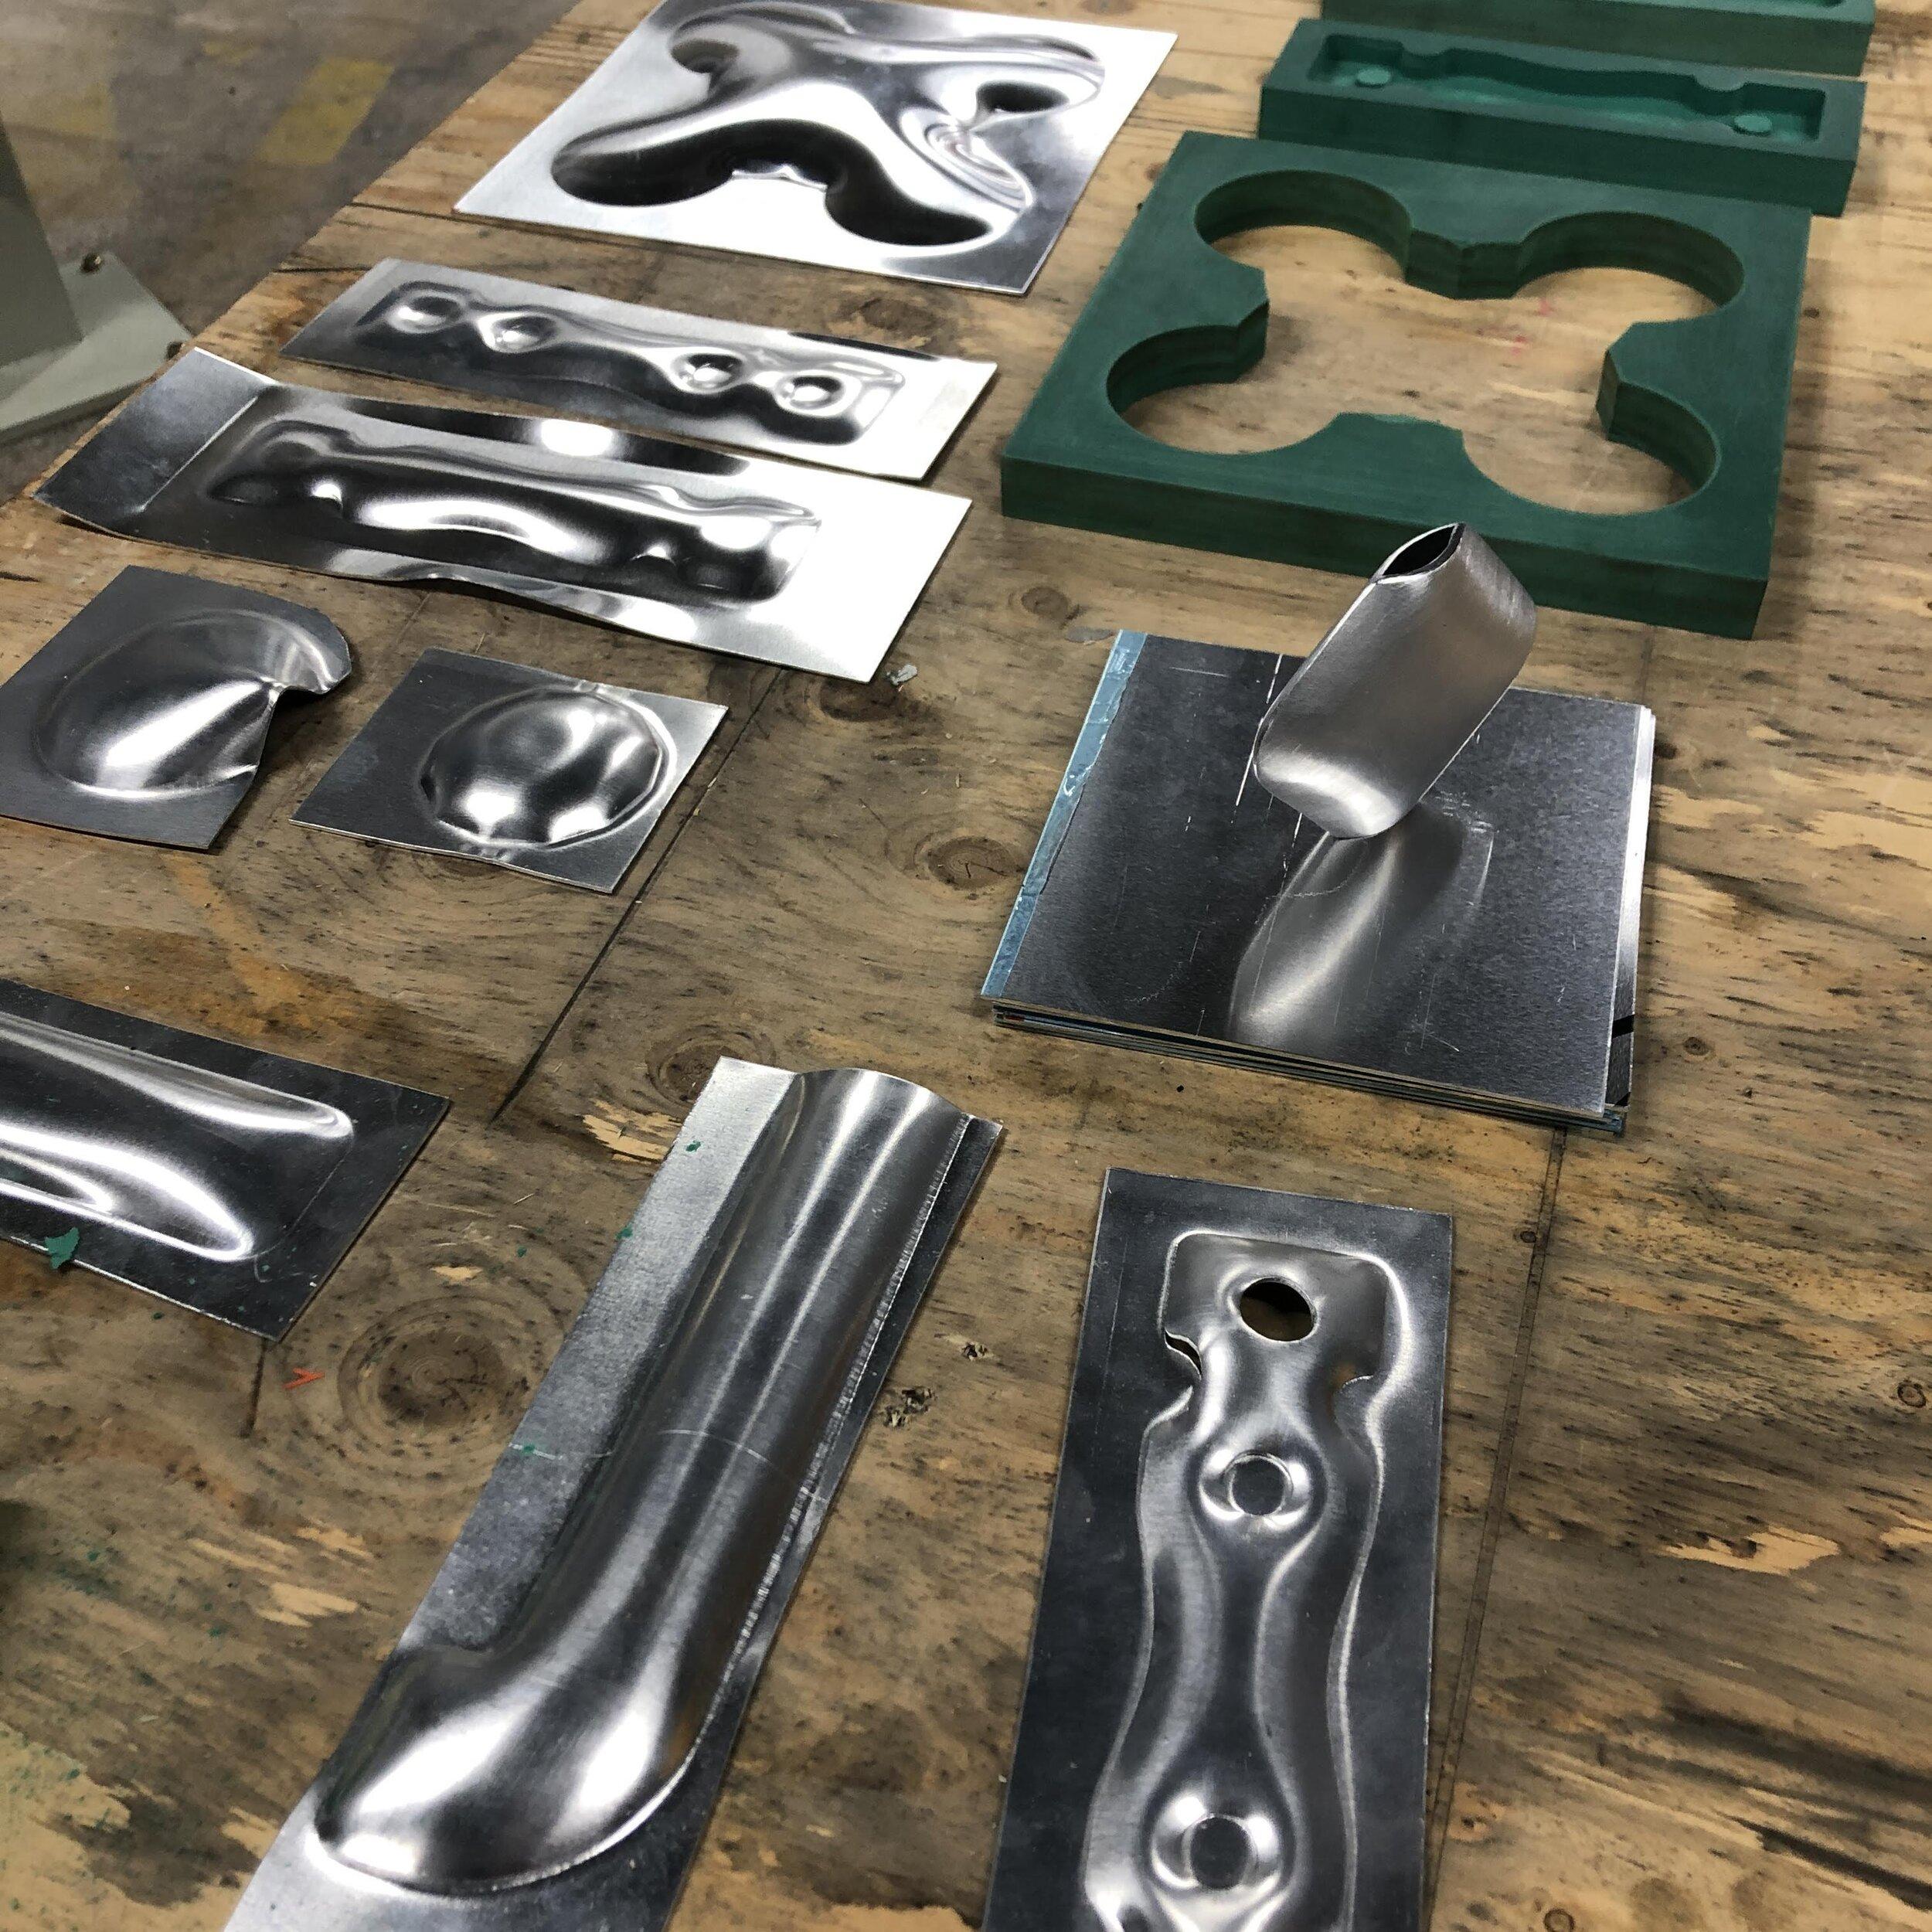 Press-form moulds - & work in progress